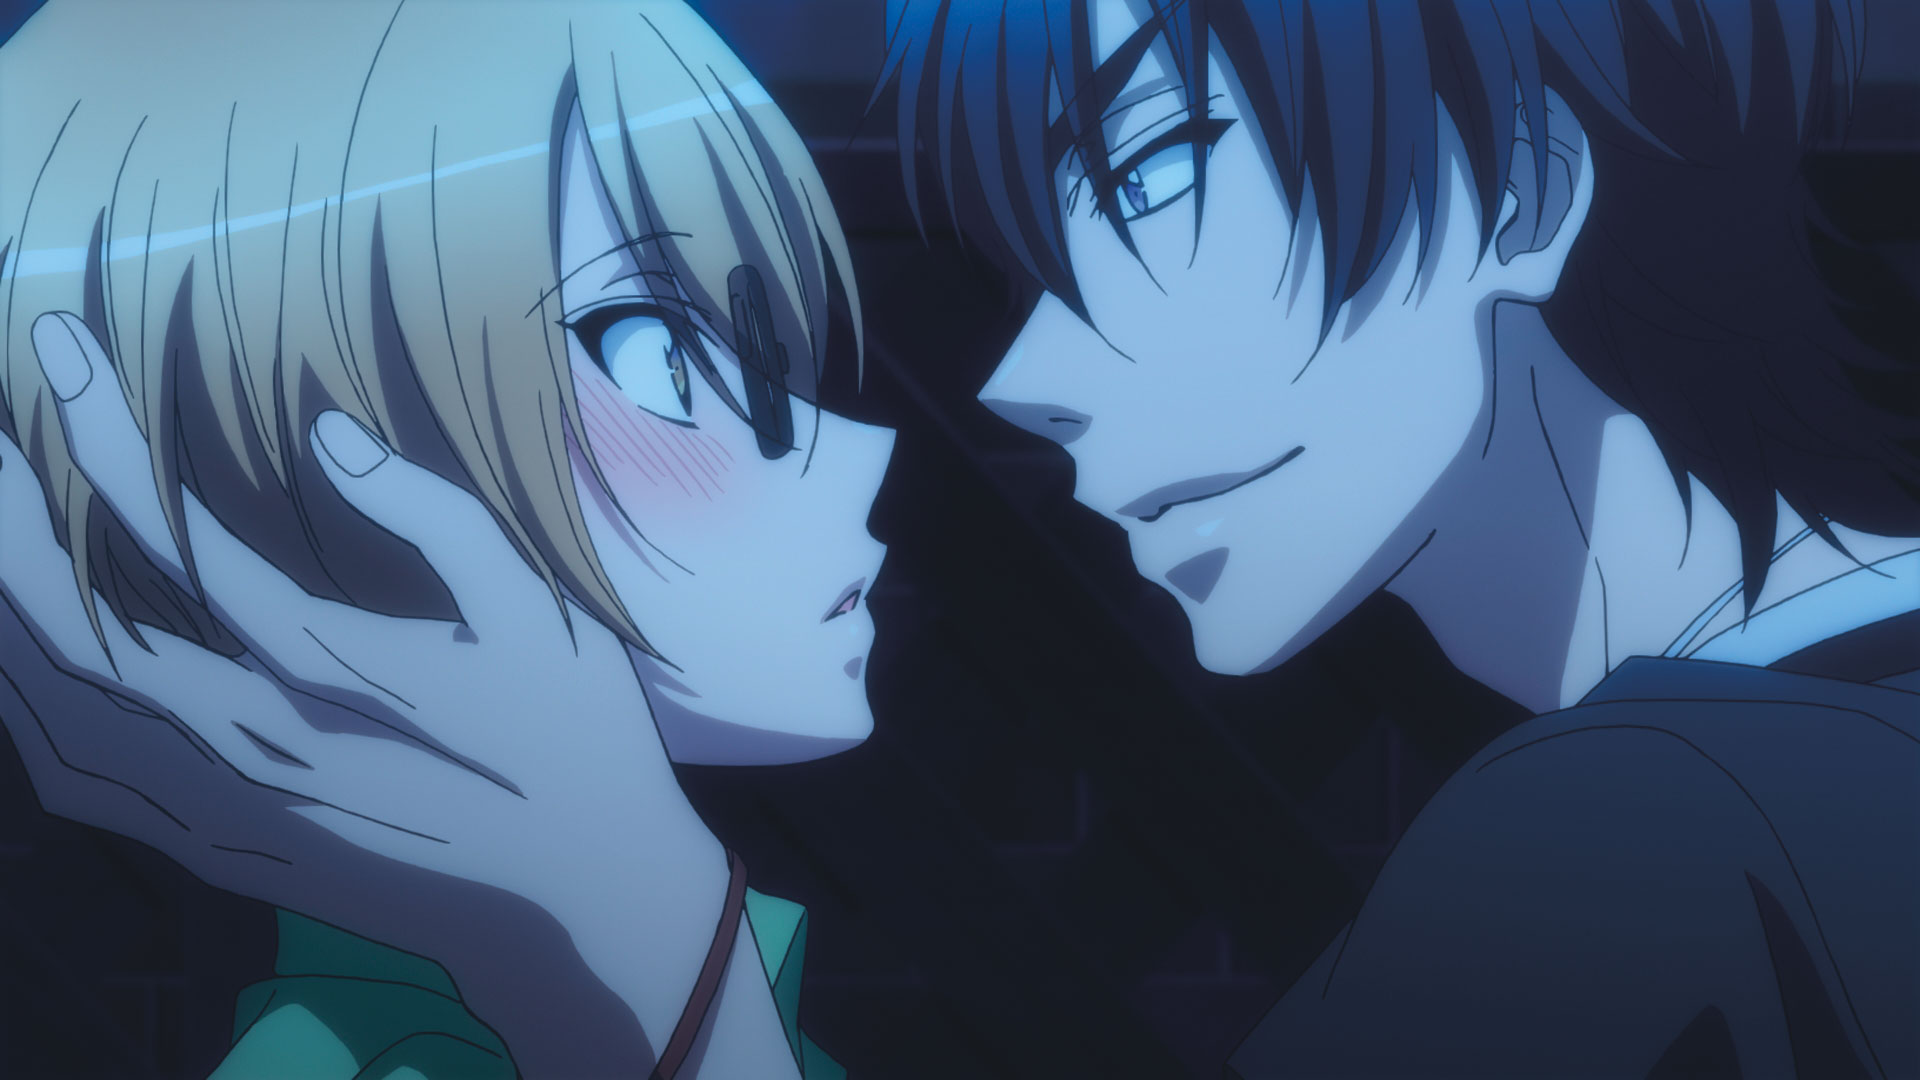 Image Result For Anime Wallpaper Sada